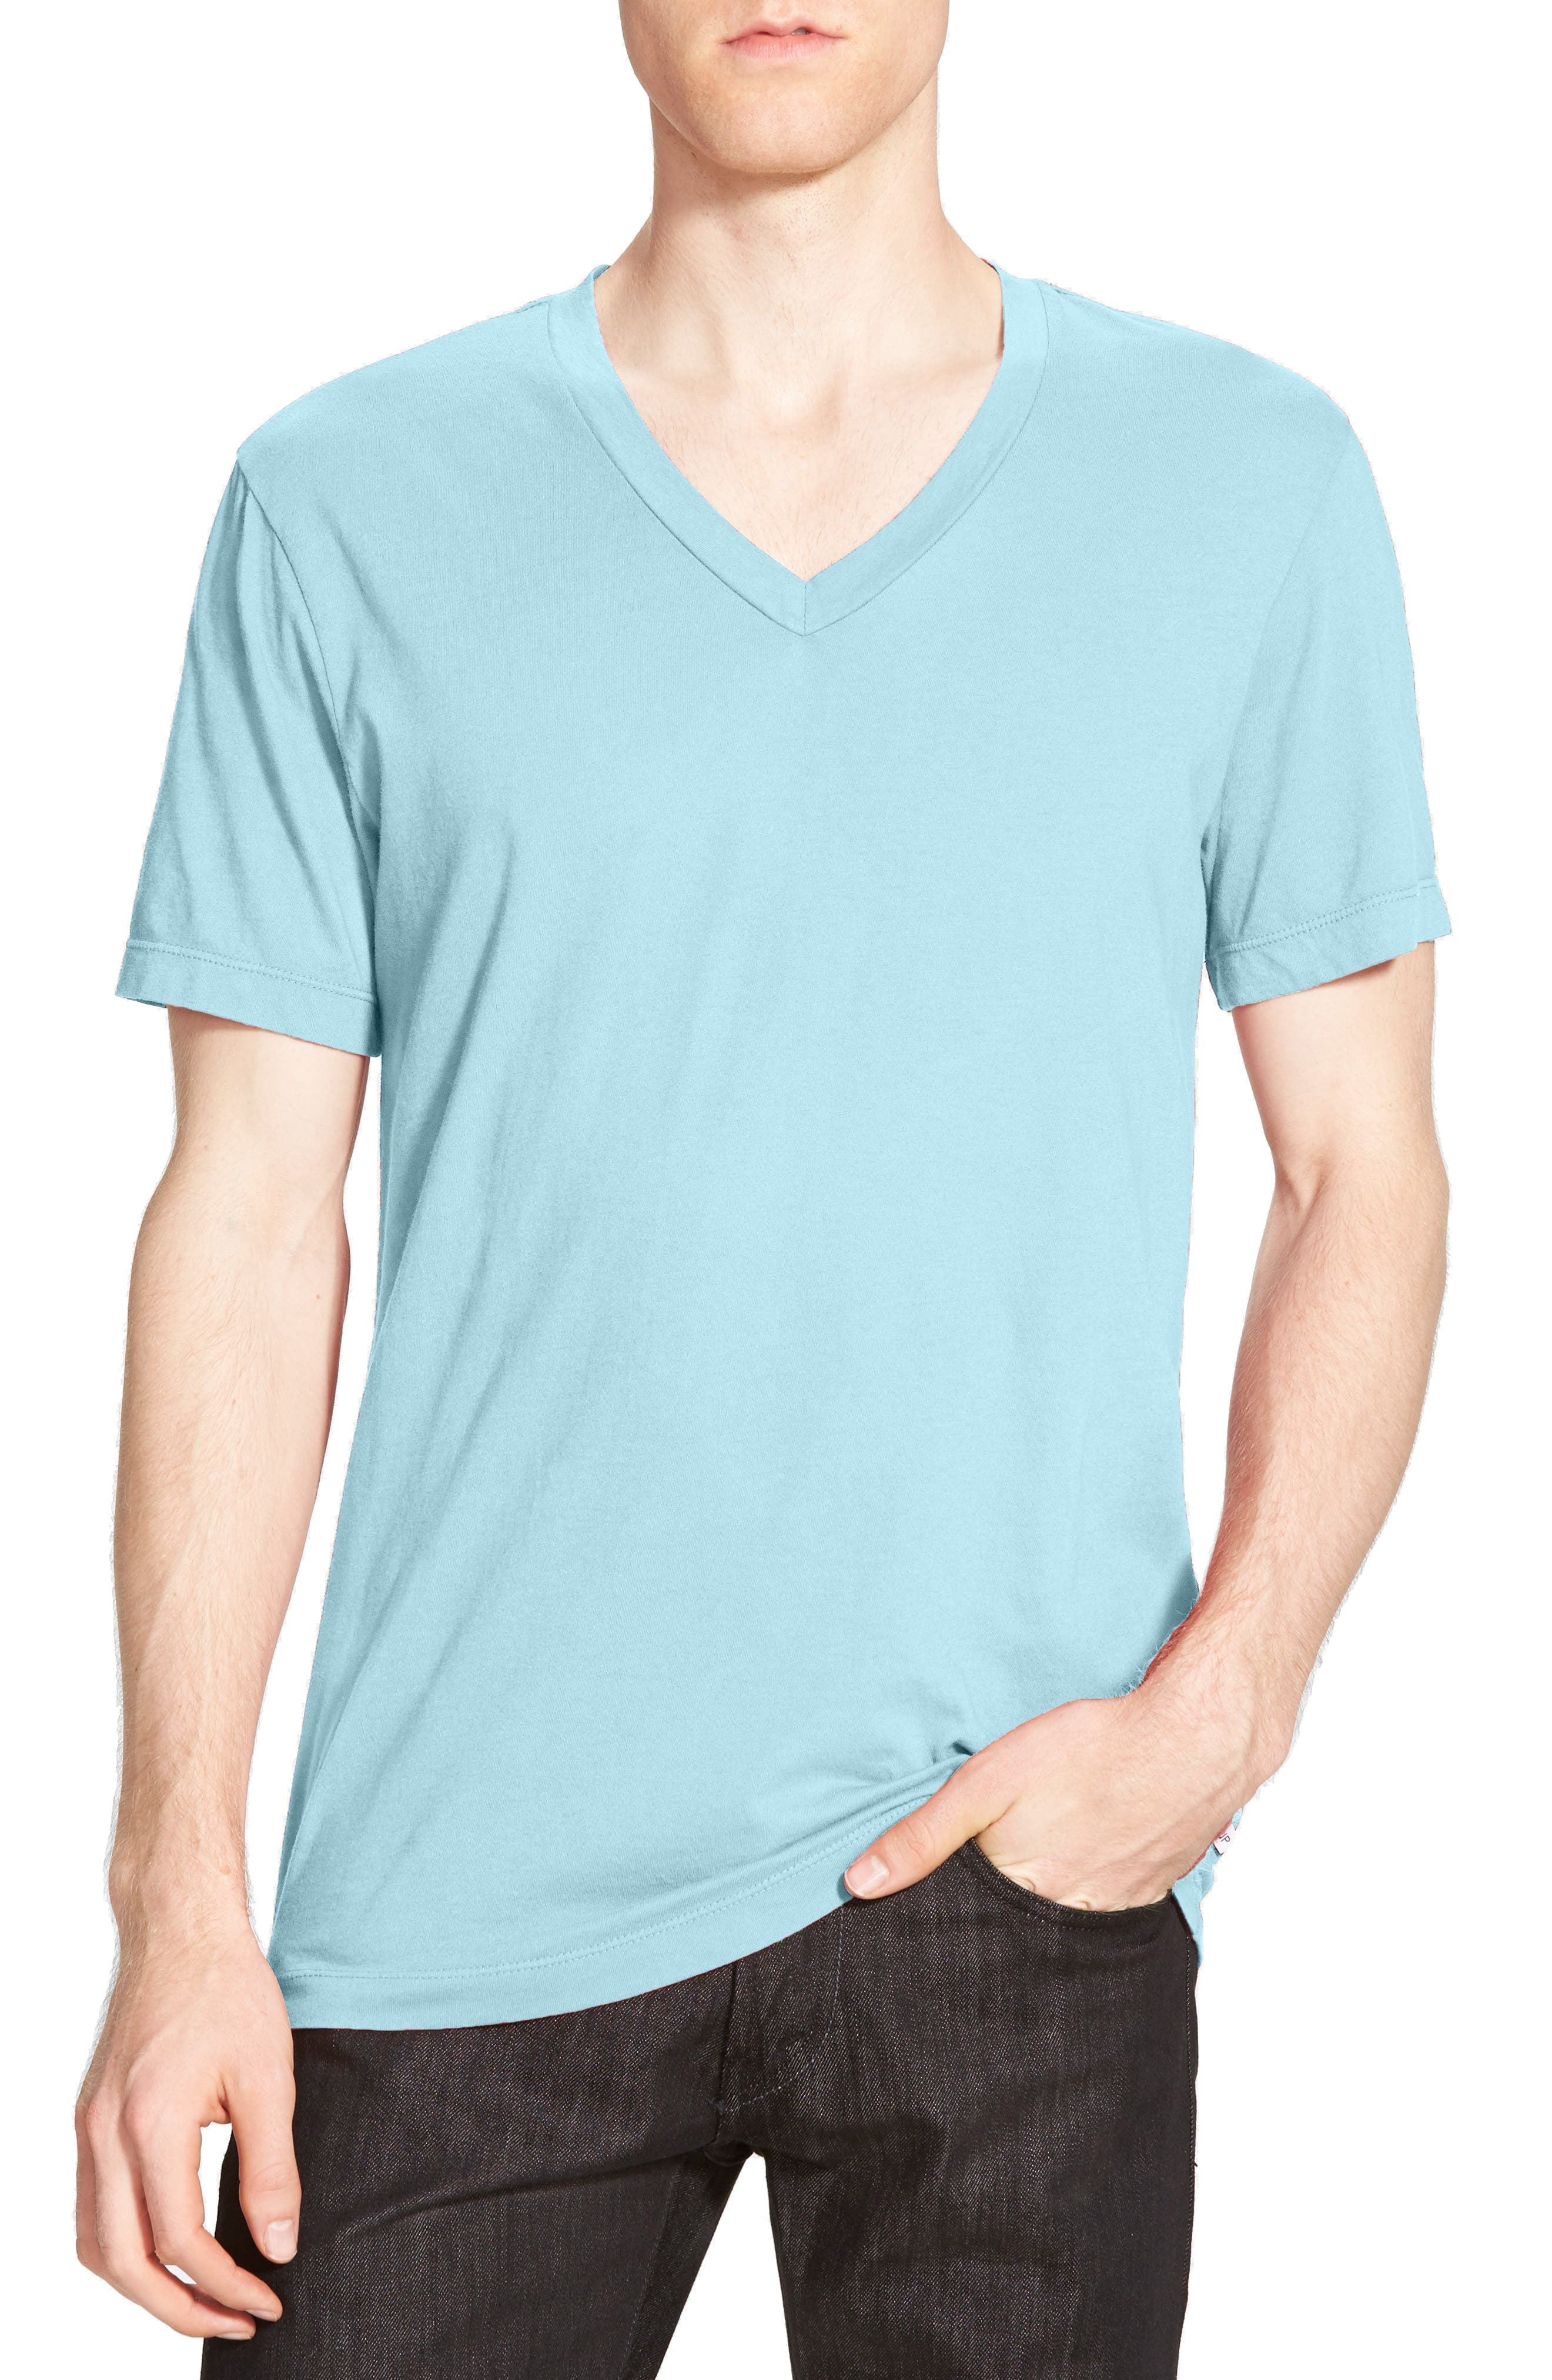 Main Image - James Perse Short Sleeve V-Neck T-Shirt